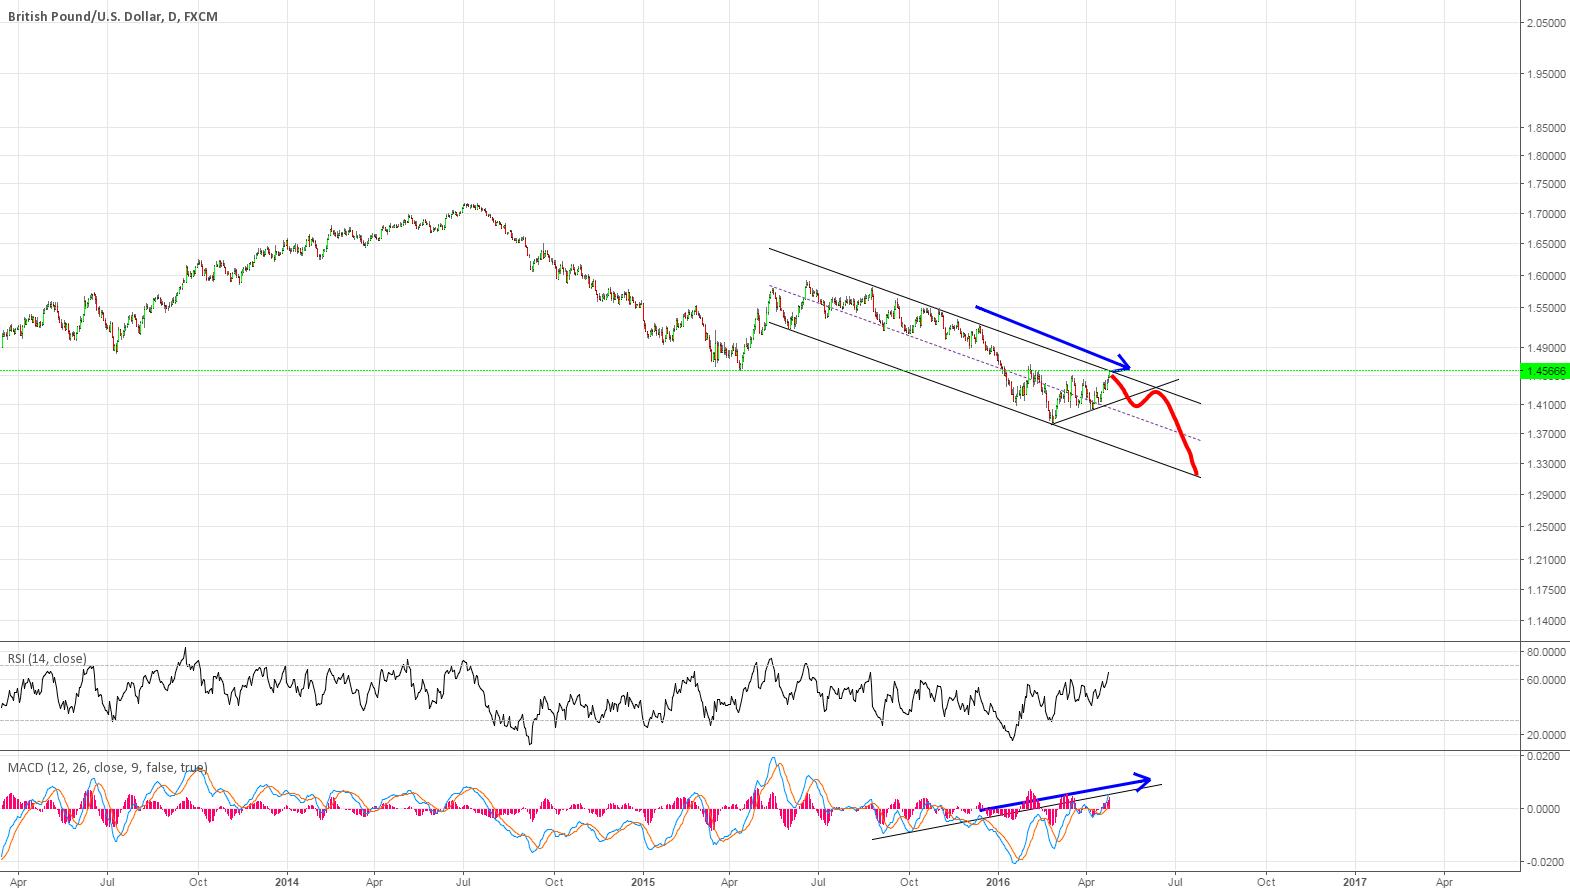 GBPUSD Short speculation